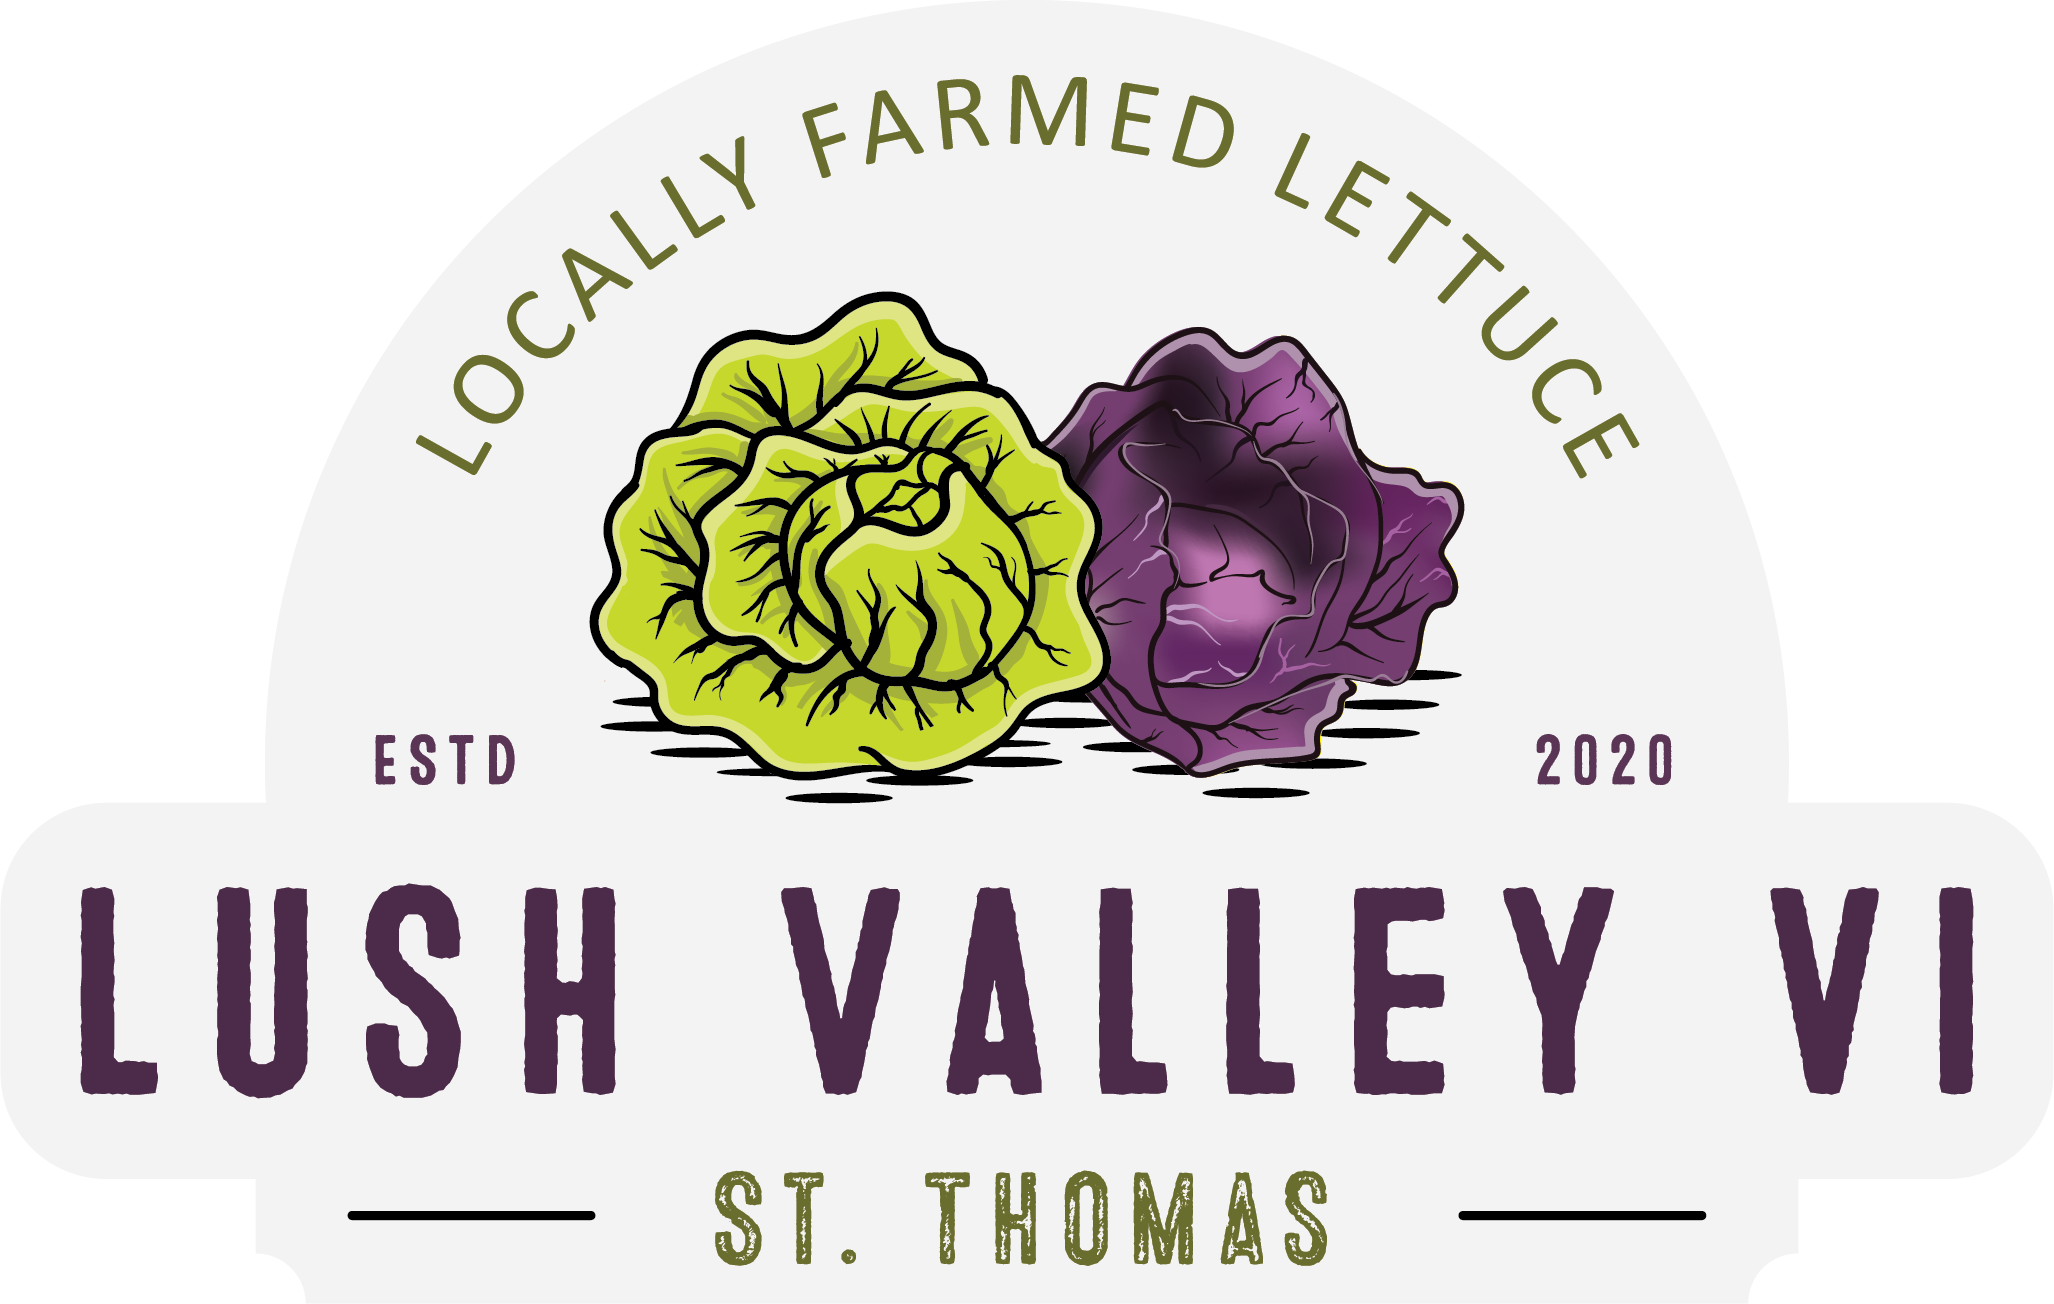 Lush Valley VI